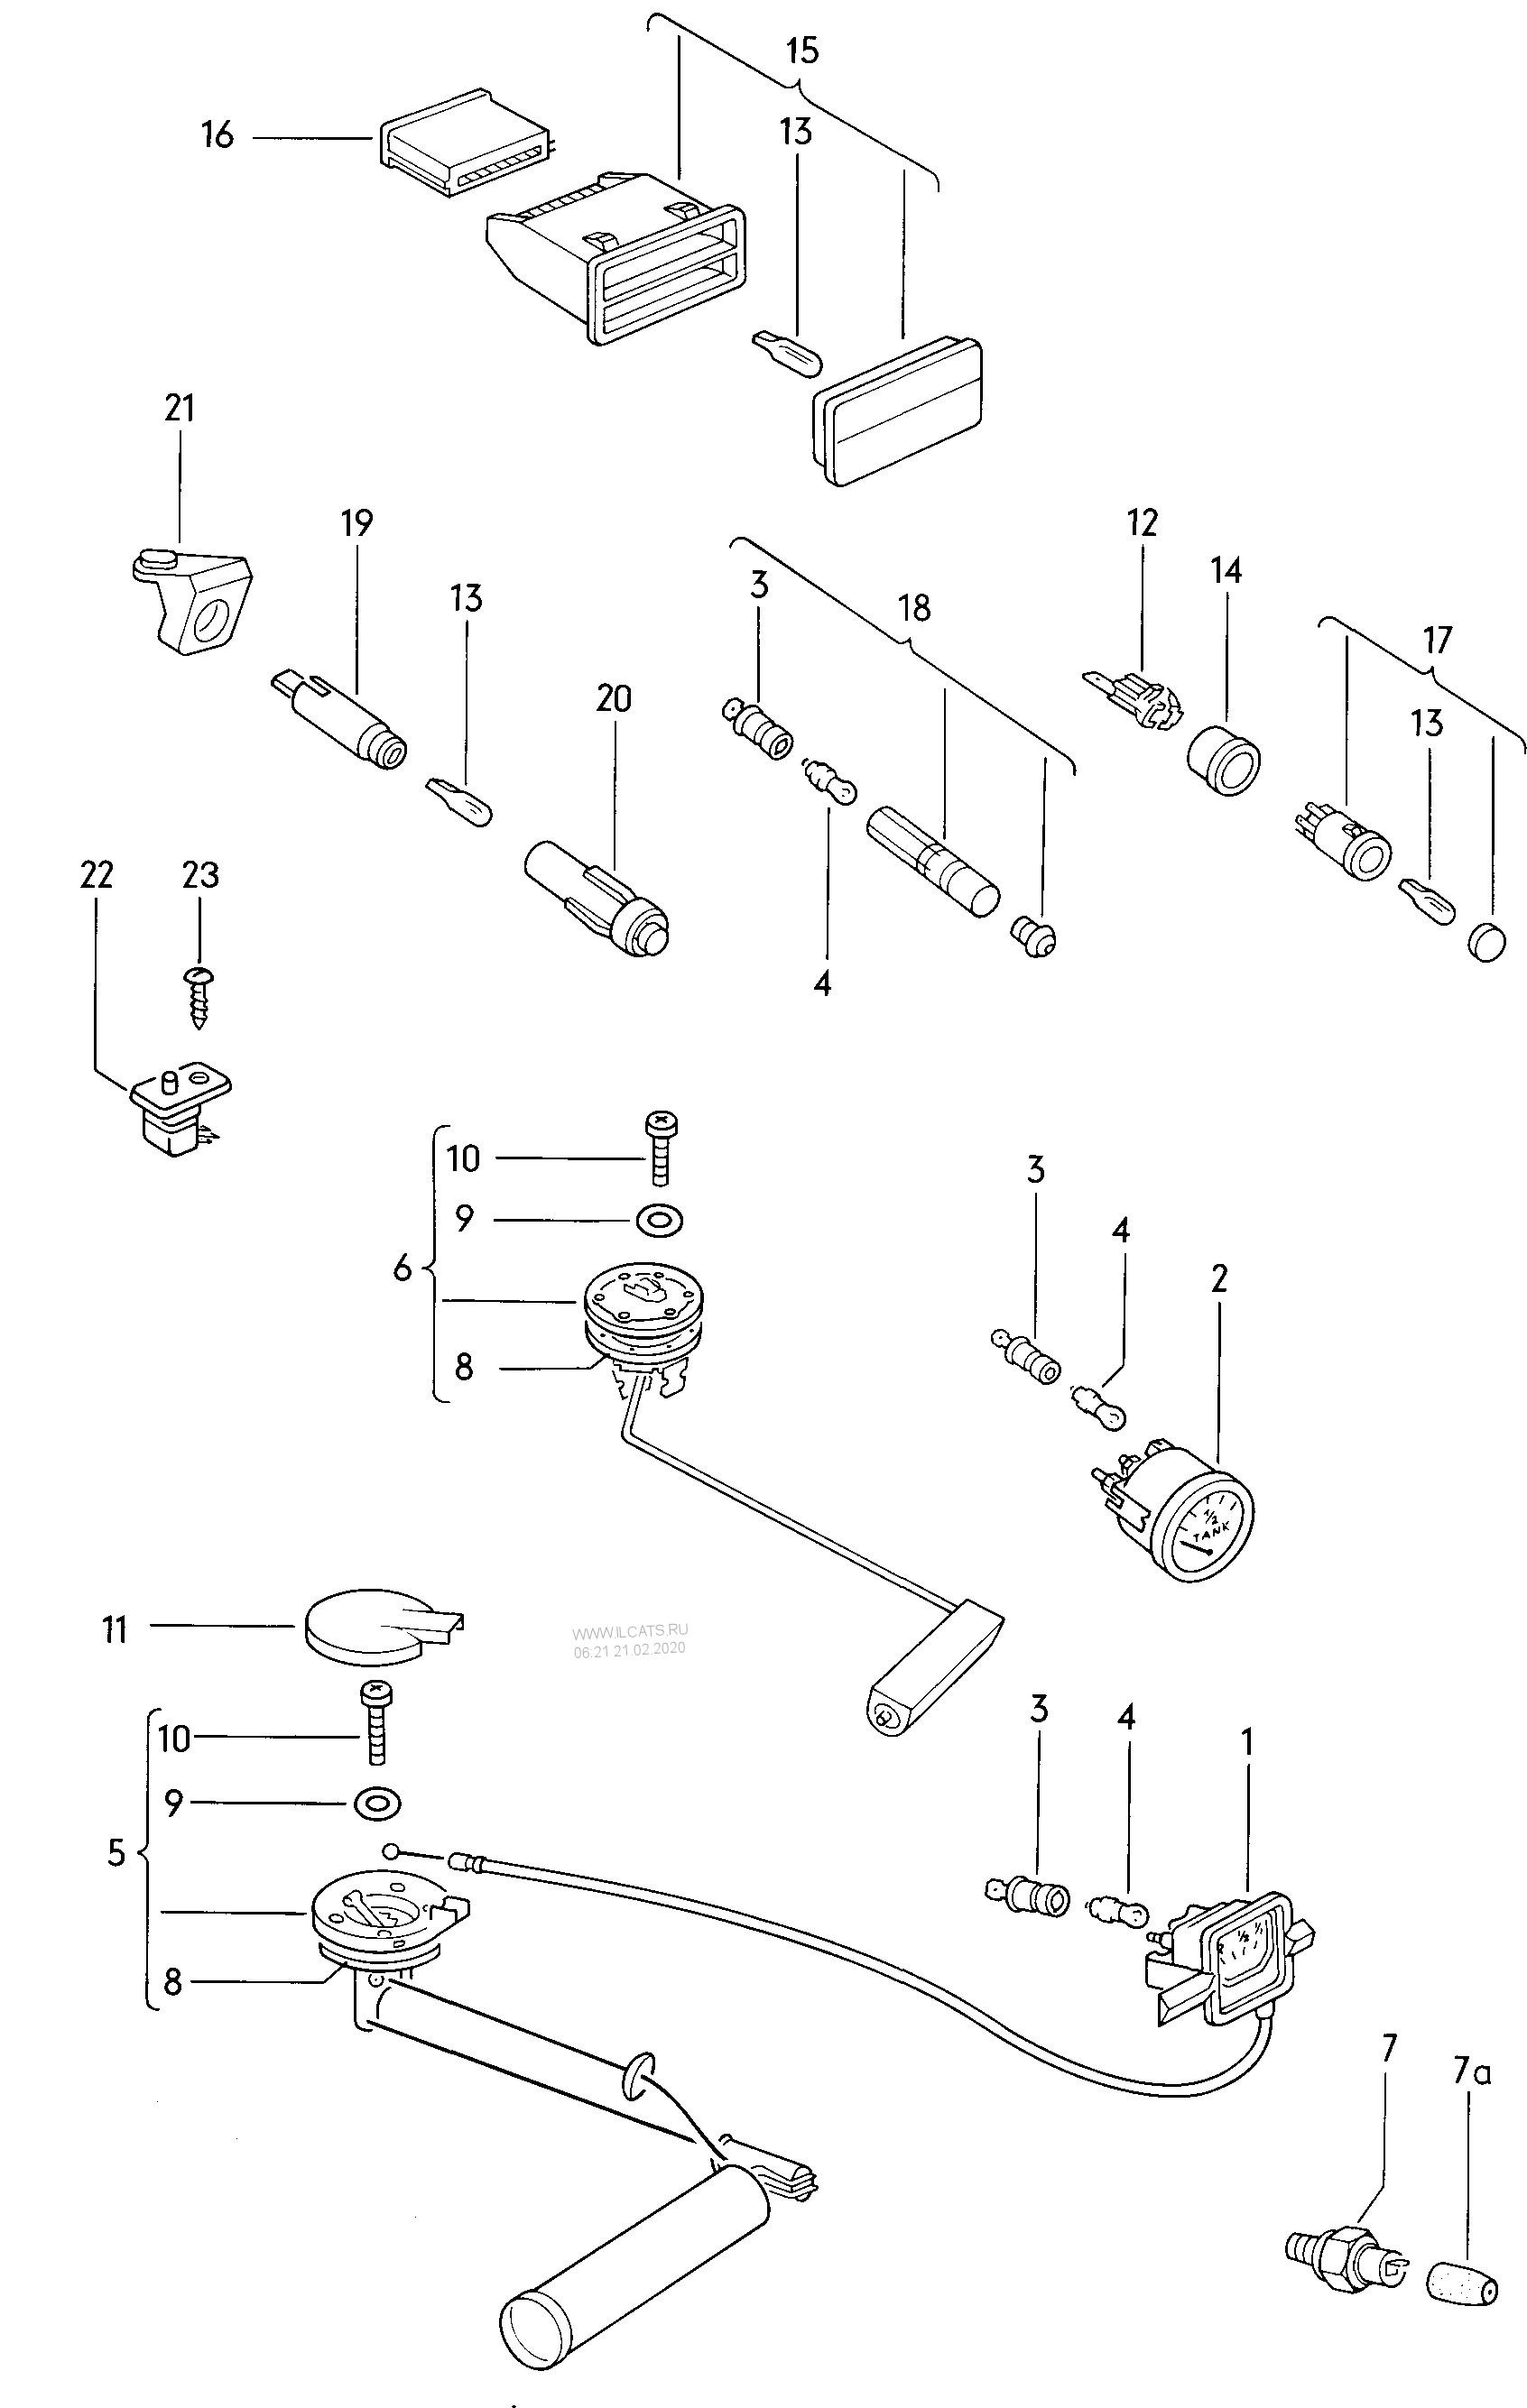 Vdo Oil Pressure Gauge Wiring Instructions